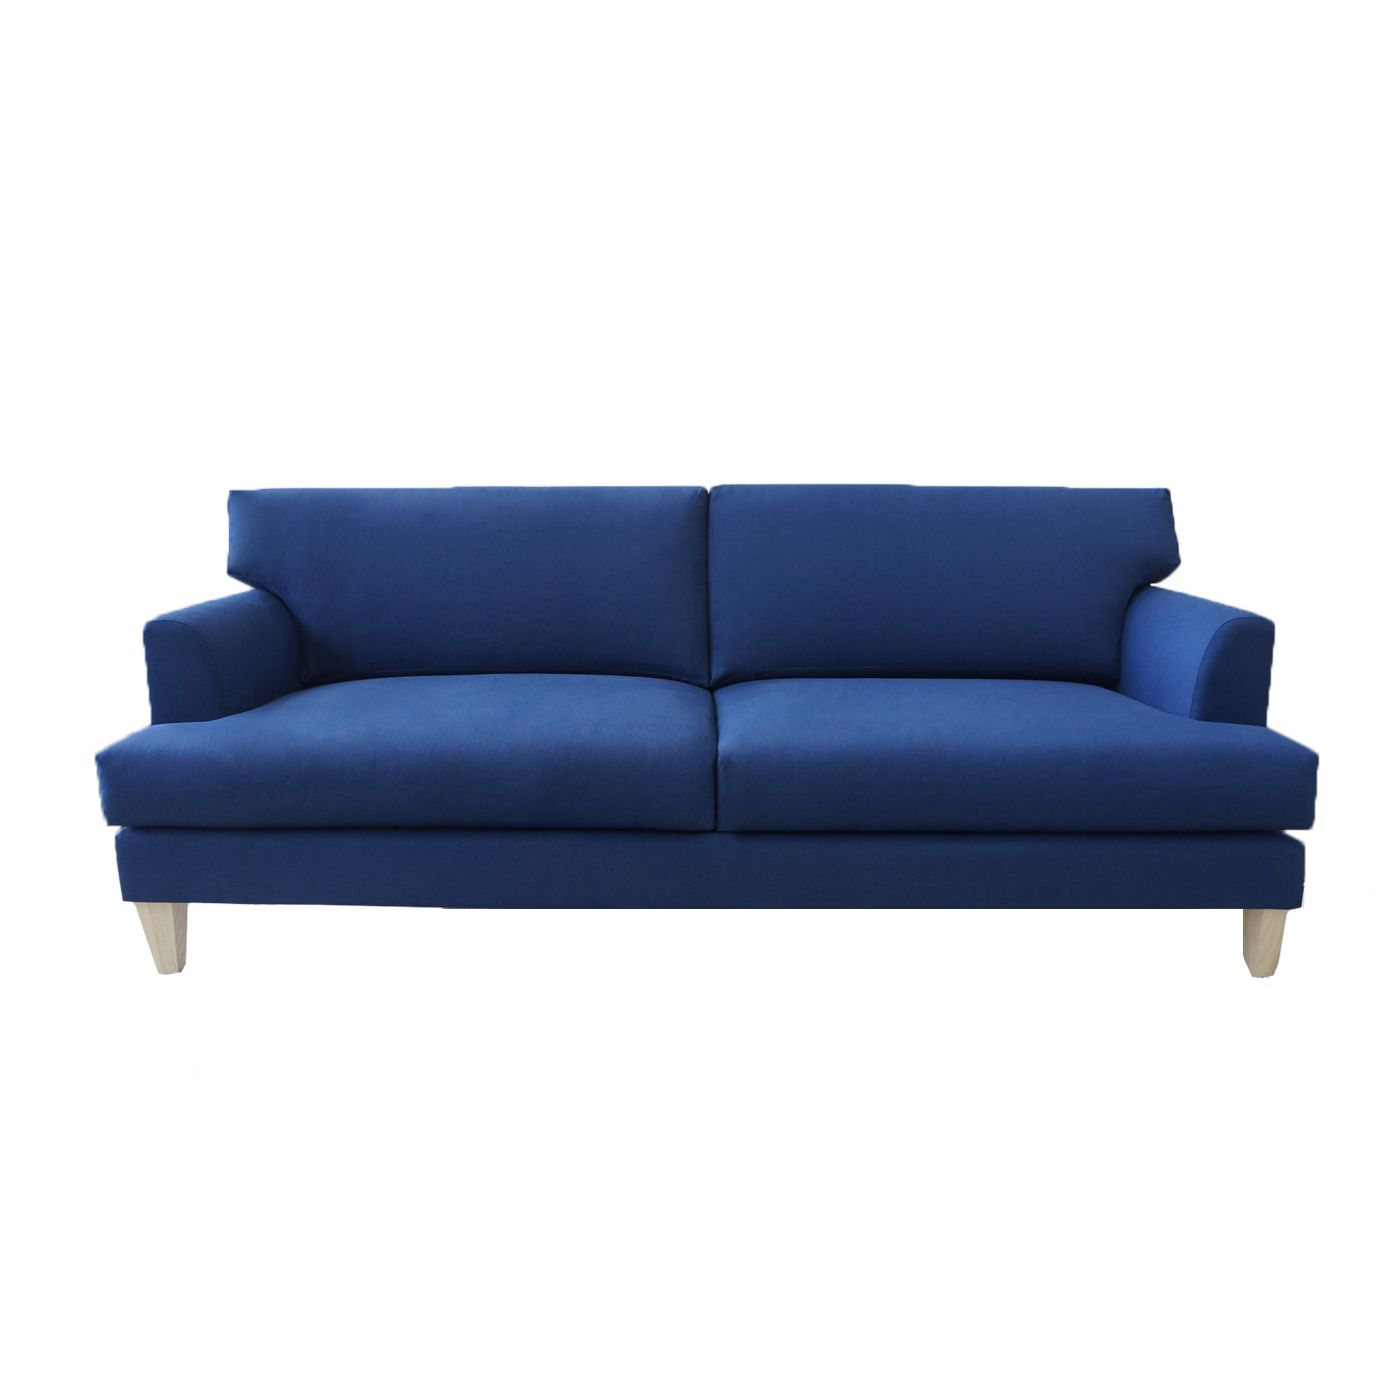 Ekla Home With Ferrous Hardware Ashley Legs Organic Furniture Sofa Handmade Organic Sofa